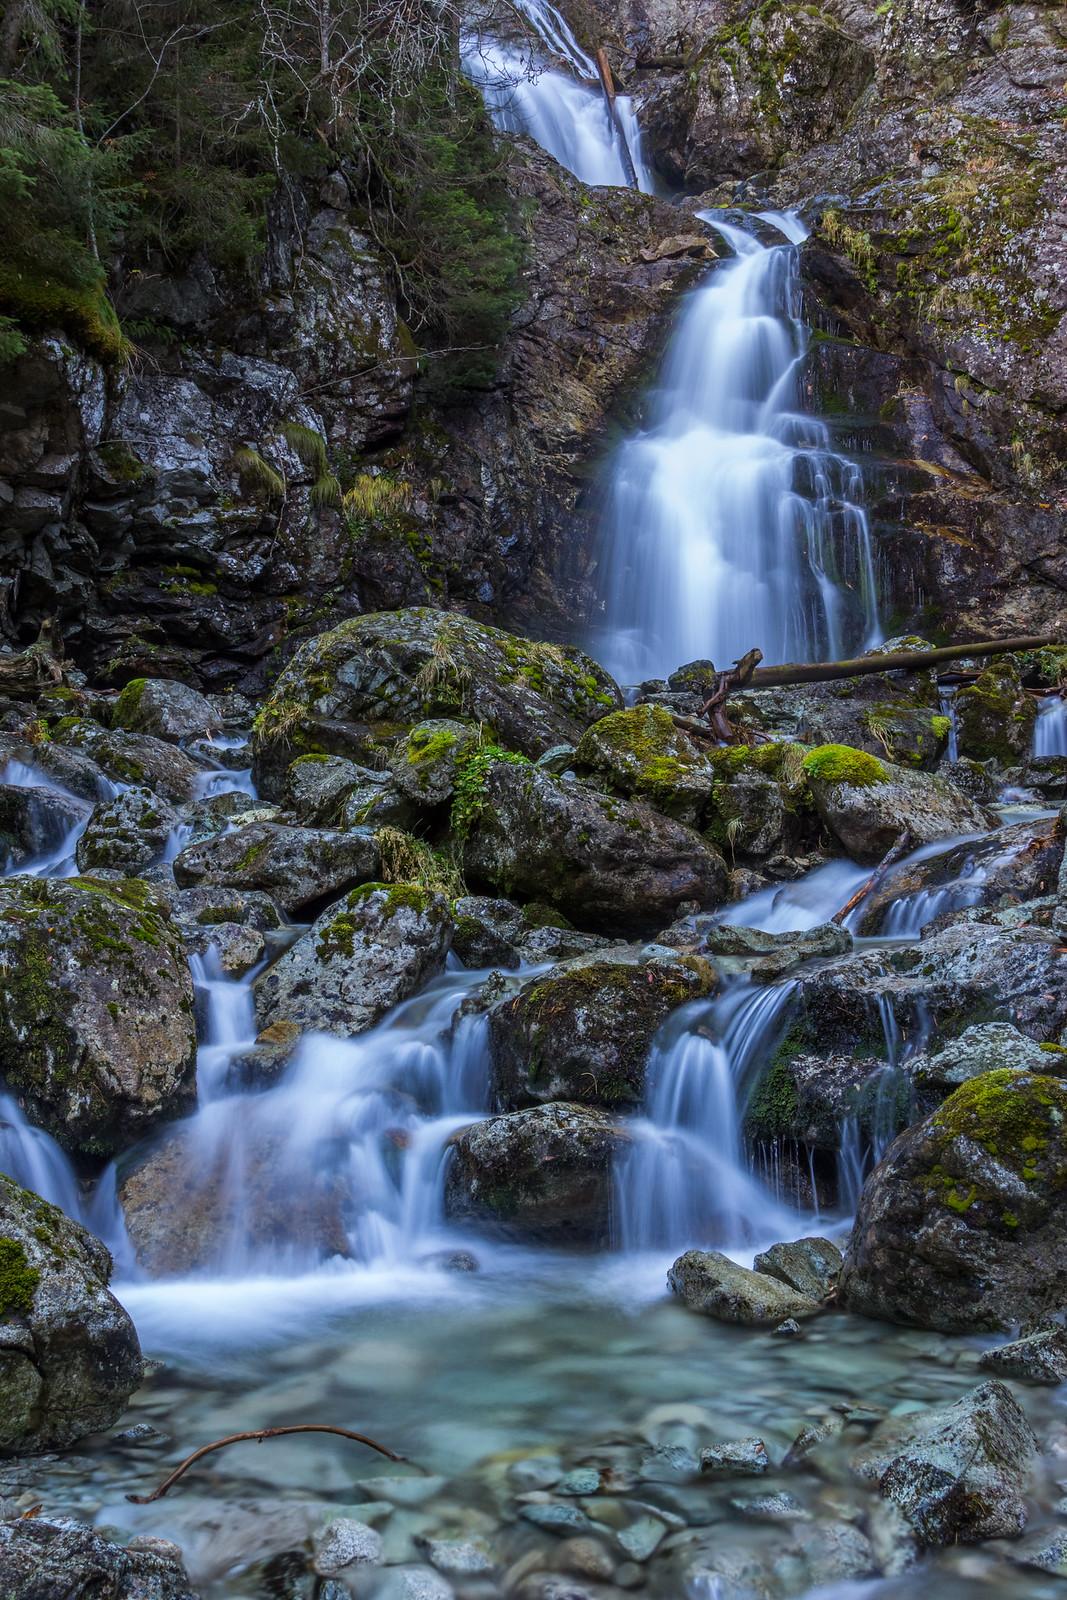 Kmeťov Vodopád / Kmetov Waterfall